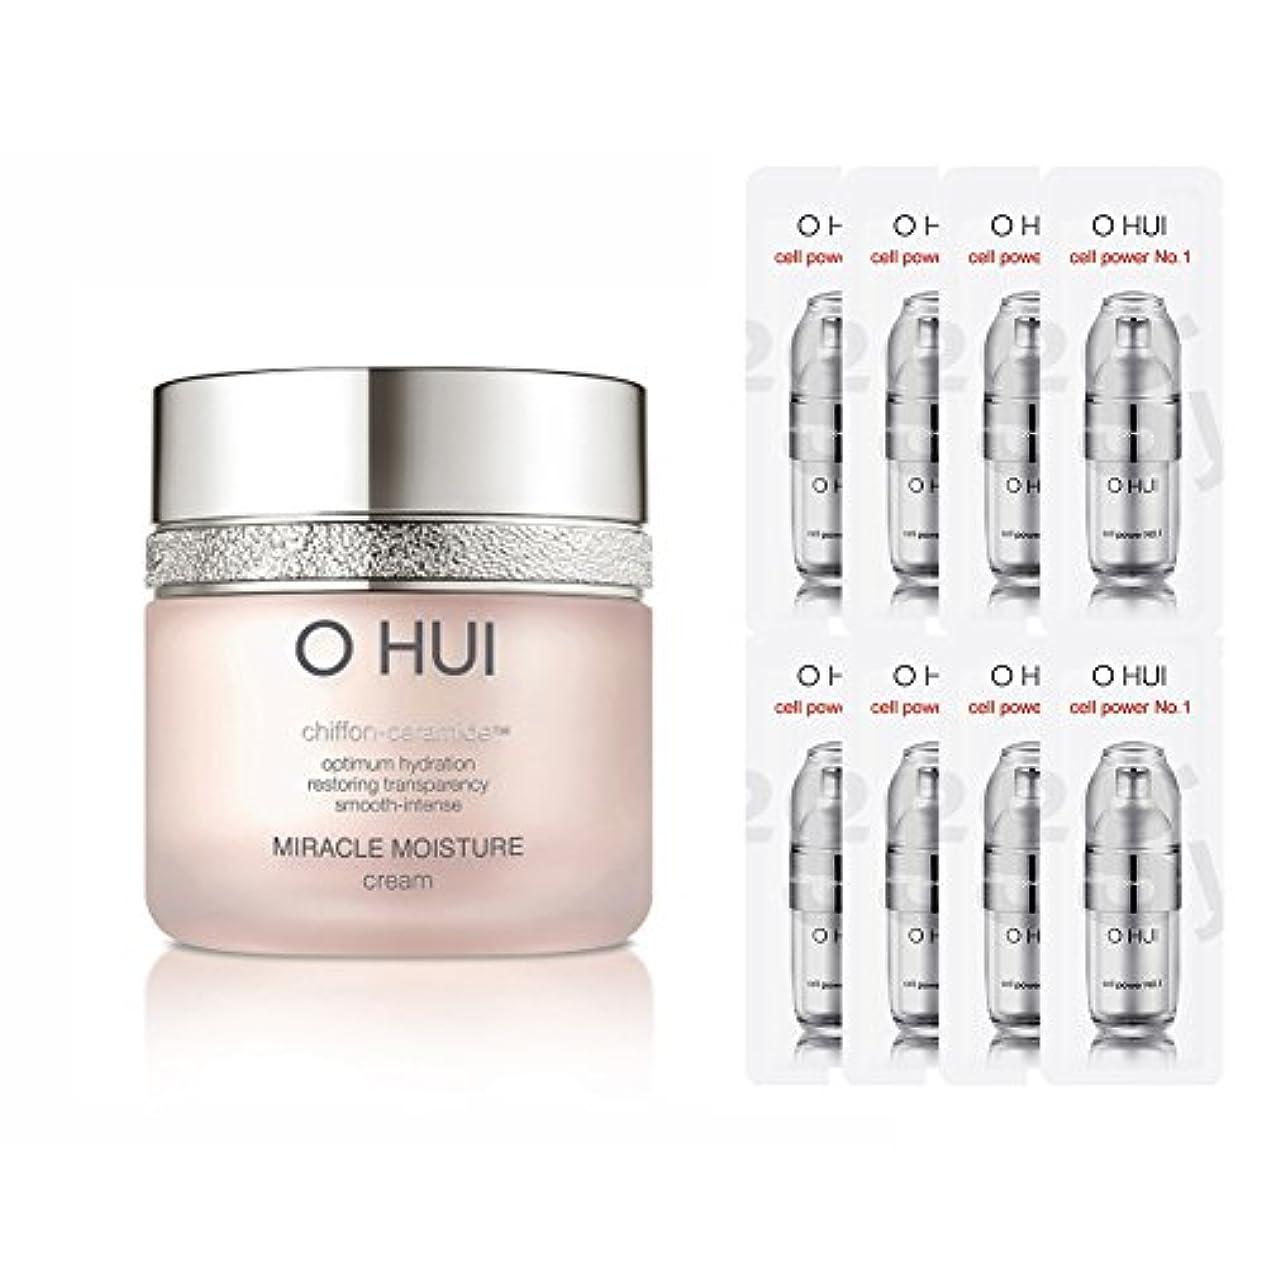 OHUI/オフィミラクルモイスチャークリーム 50ml (OHUI MIRACLE MOISTURE CREAM set) スポット [海外直送品]